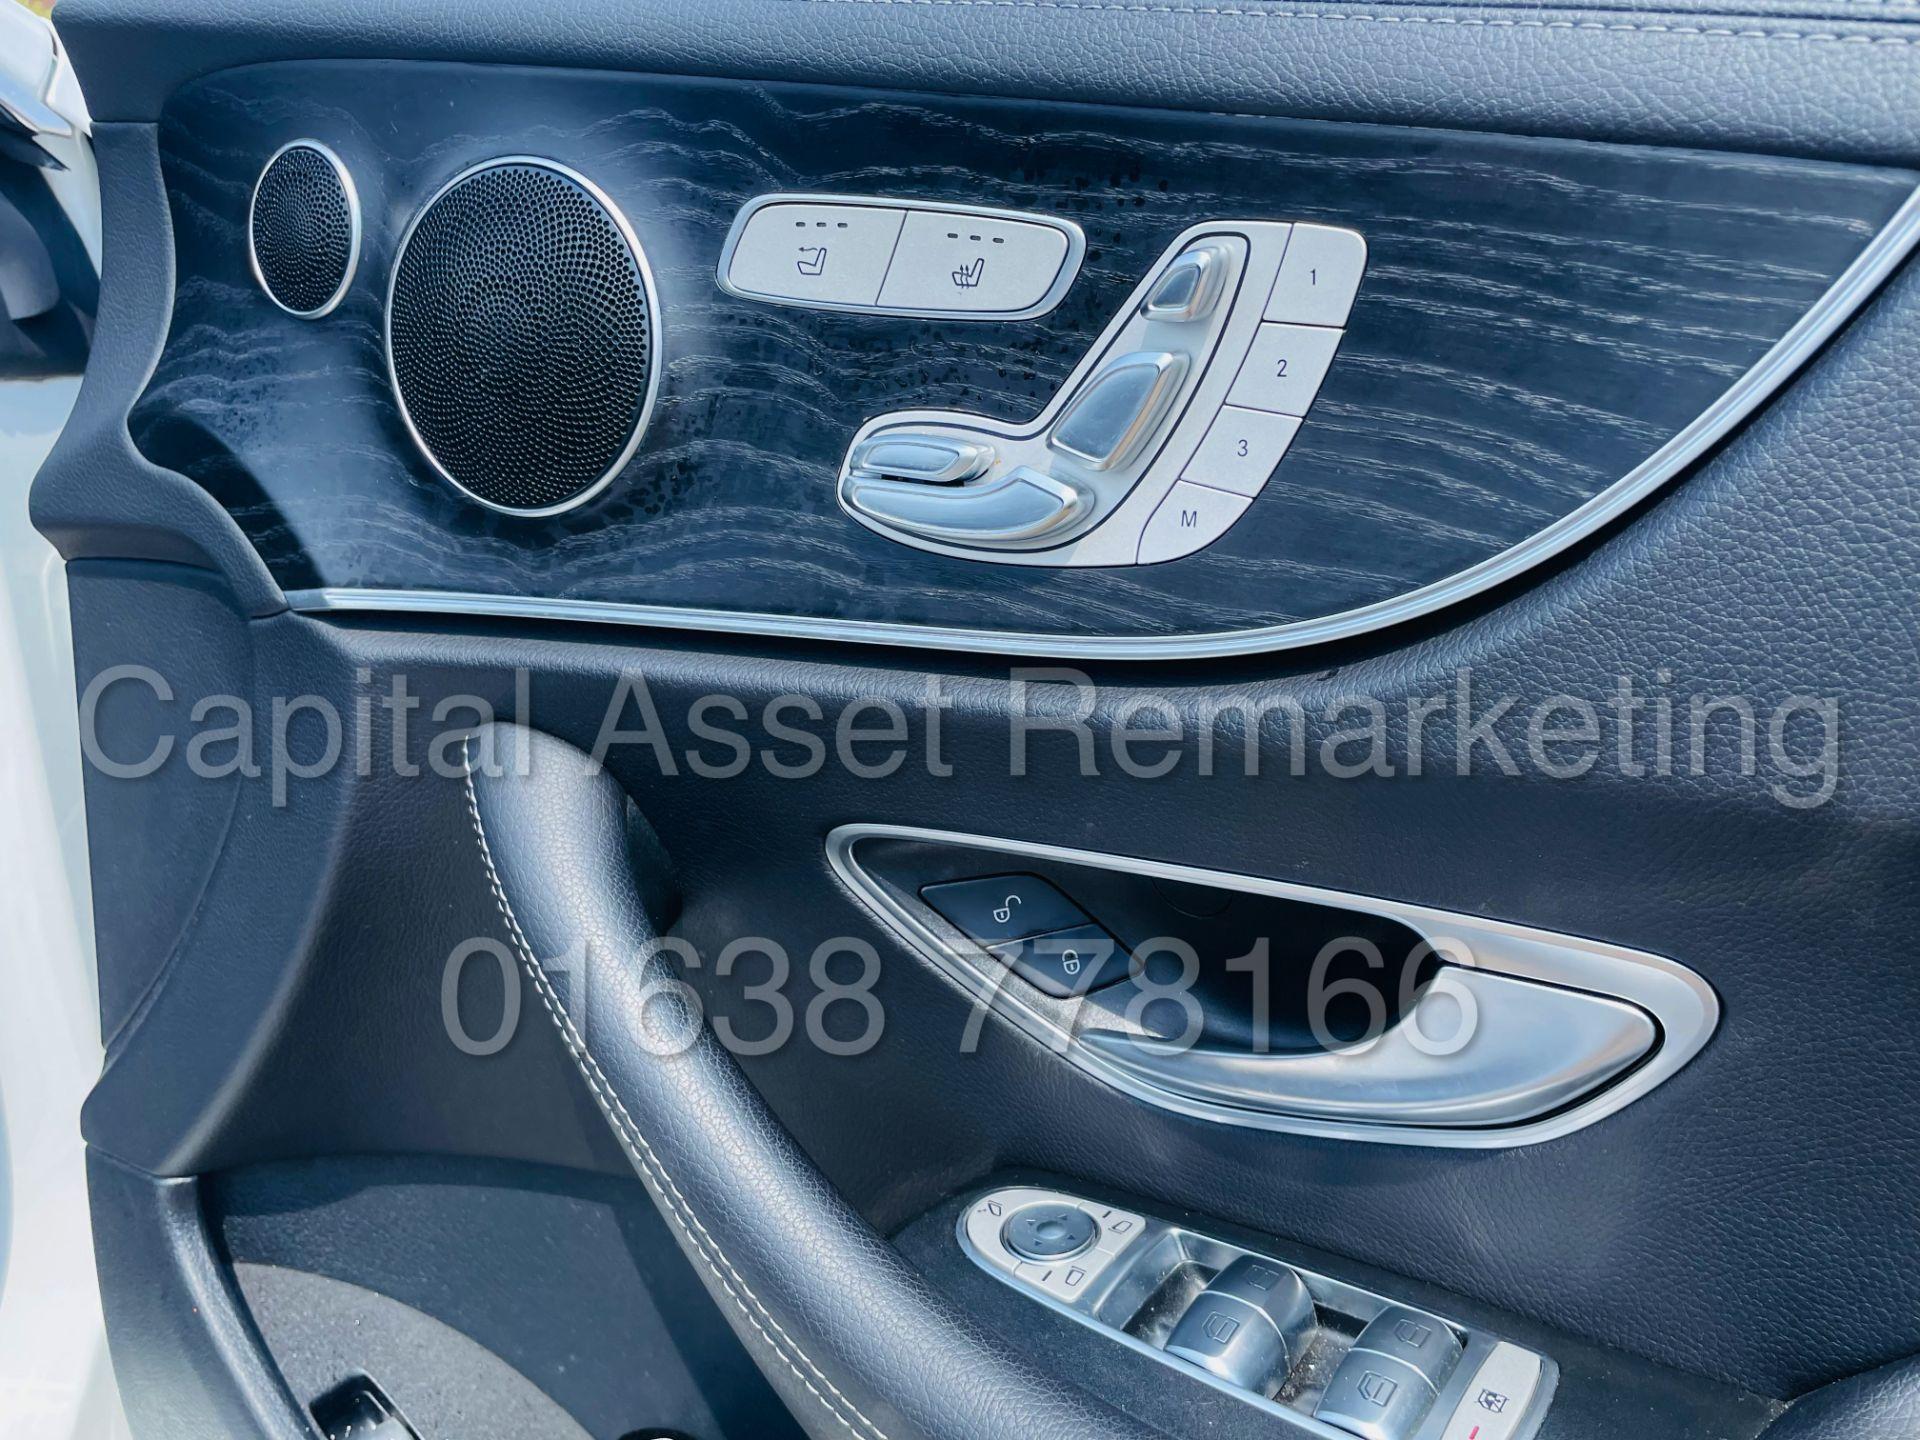 MERCEDES-BENZ E220d *AMG LINE PREMIUM - CABRIOLET* (2018 - EURO 6) '9G AUTO - LEATHER - SAT NAV' - Image 43 of 63